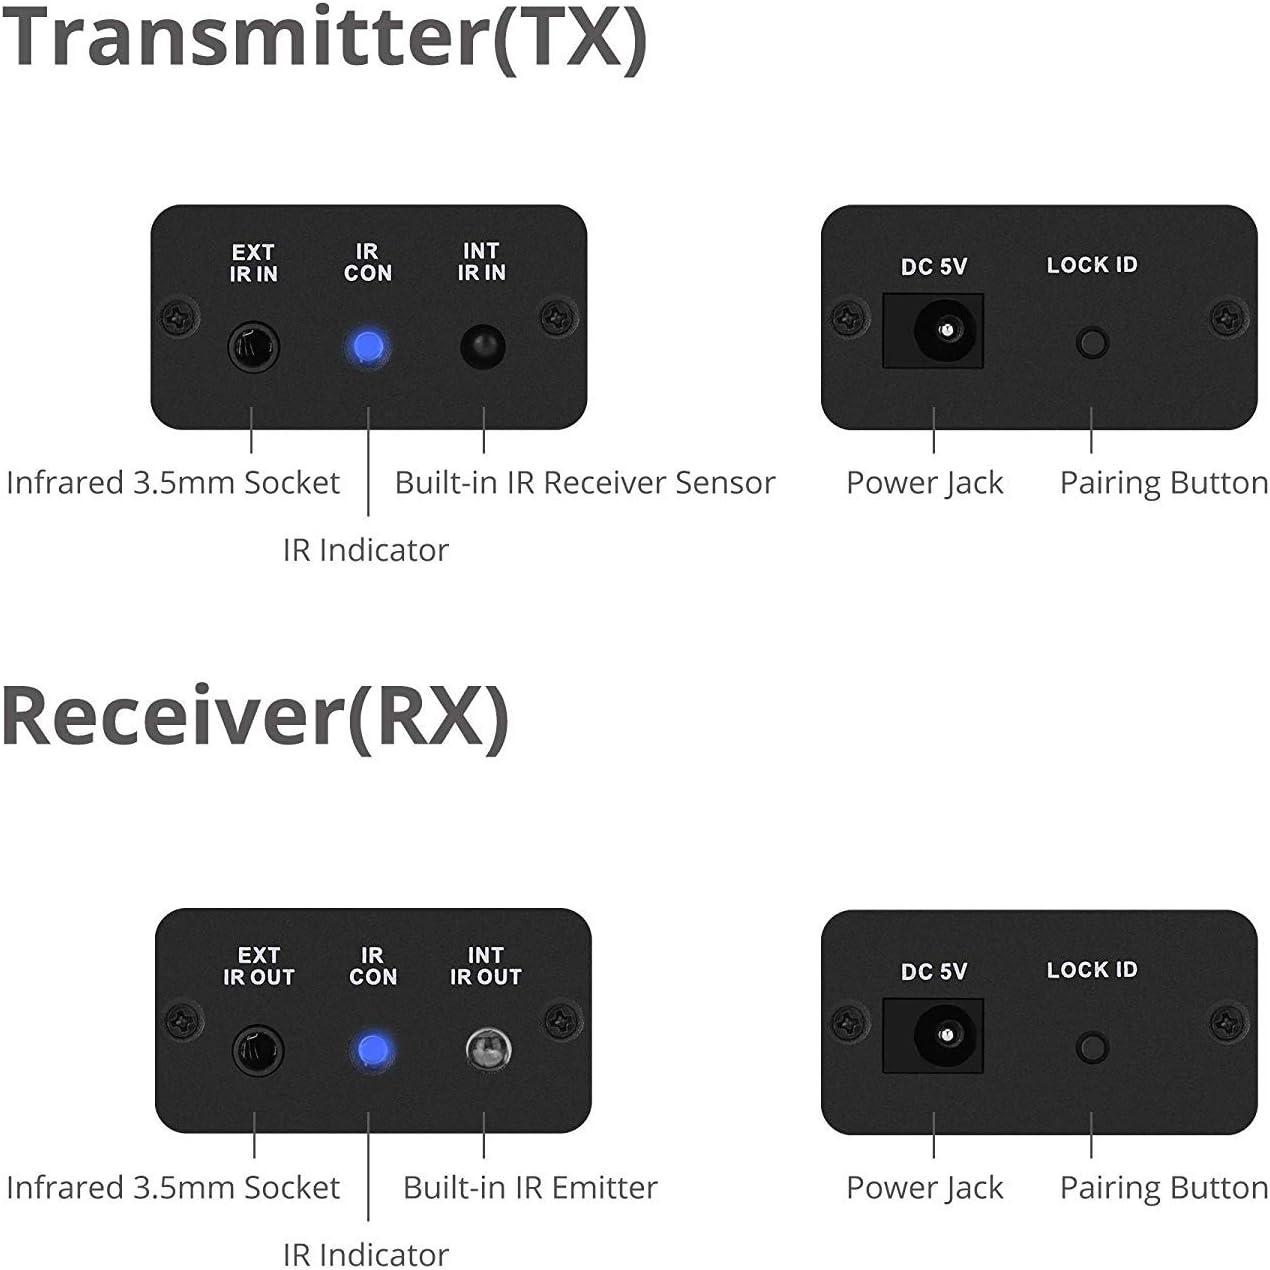 Inteset Wireless Long Range IR Repeater Extender /& Blaster Sends Infrared Using Radio Frequency RF